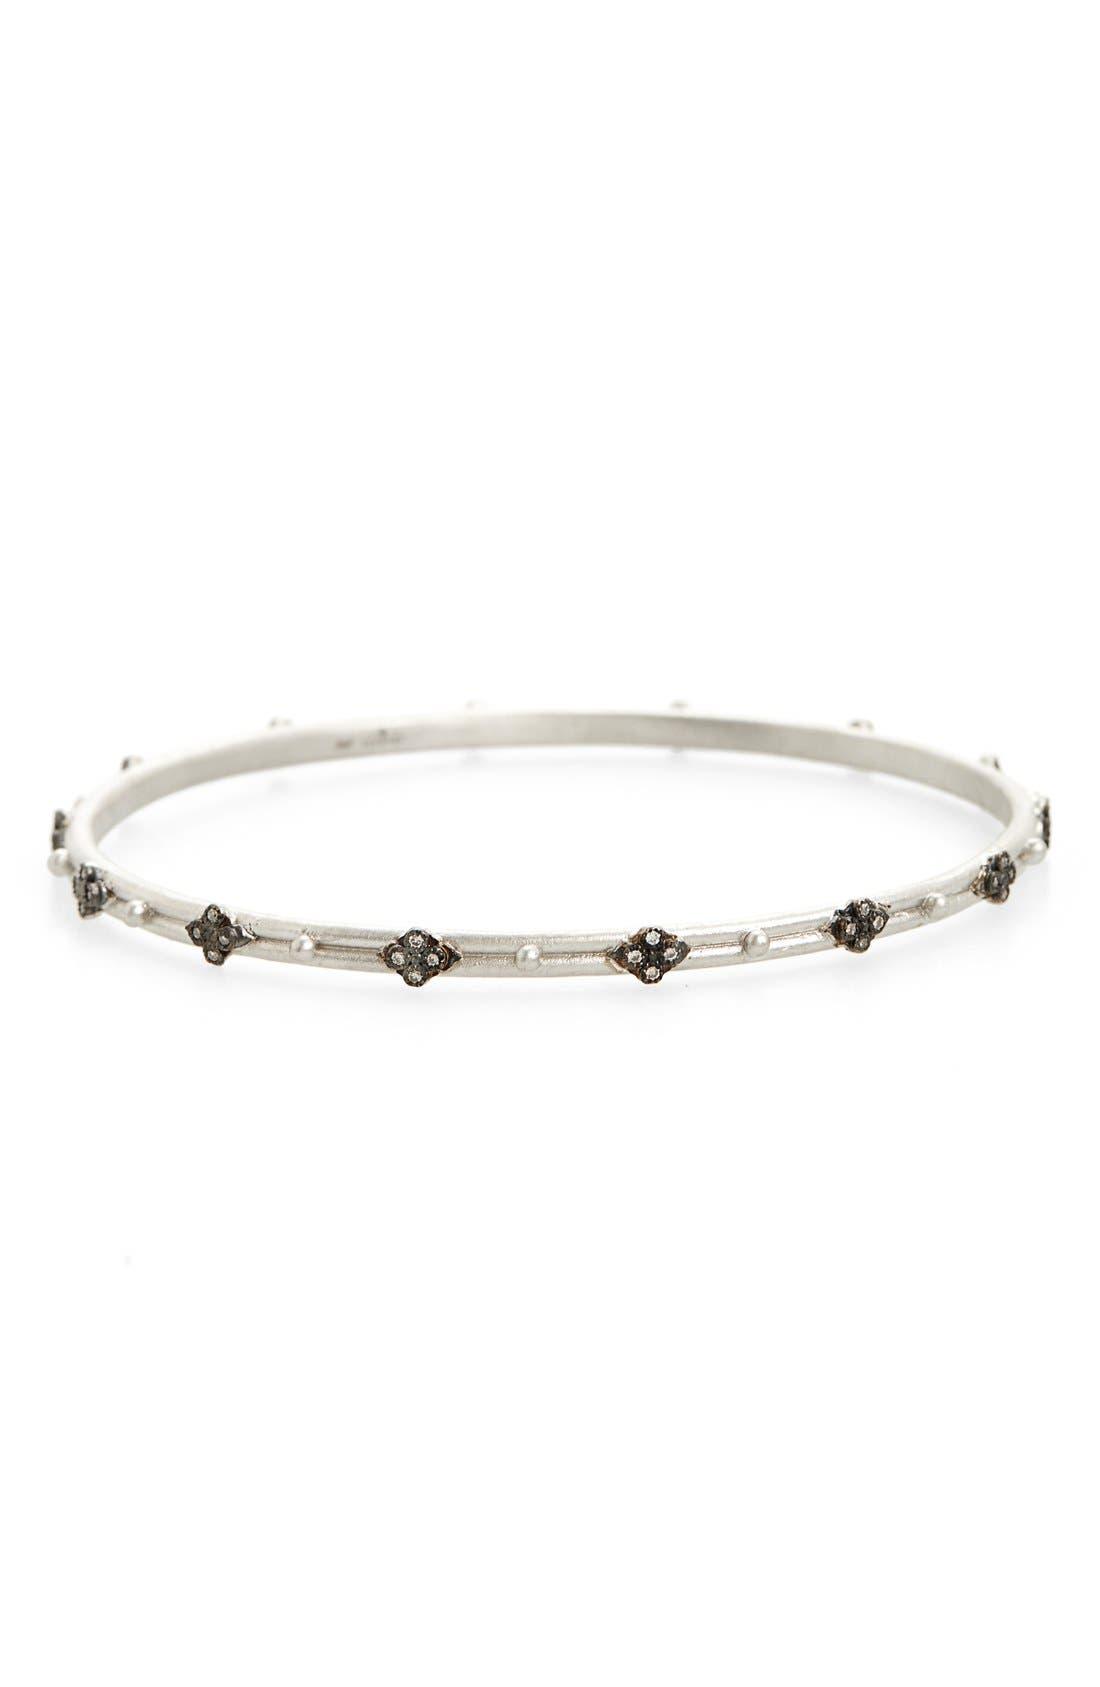 Main Image - Armenta New World Cravelli Diamond Bangle